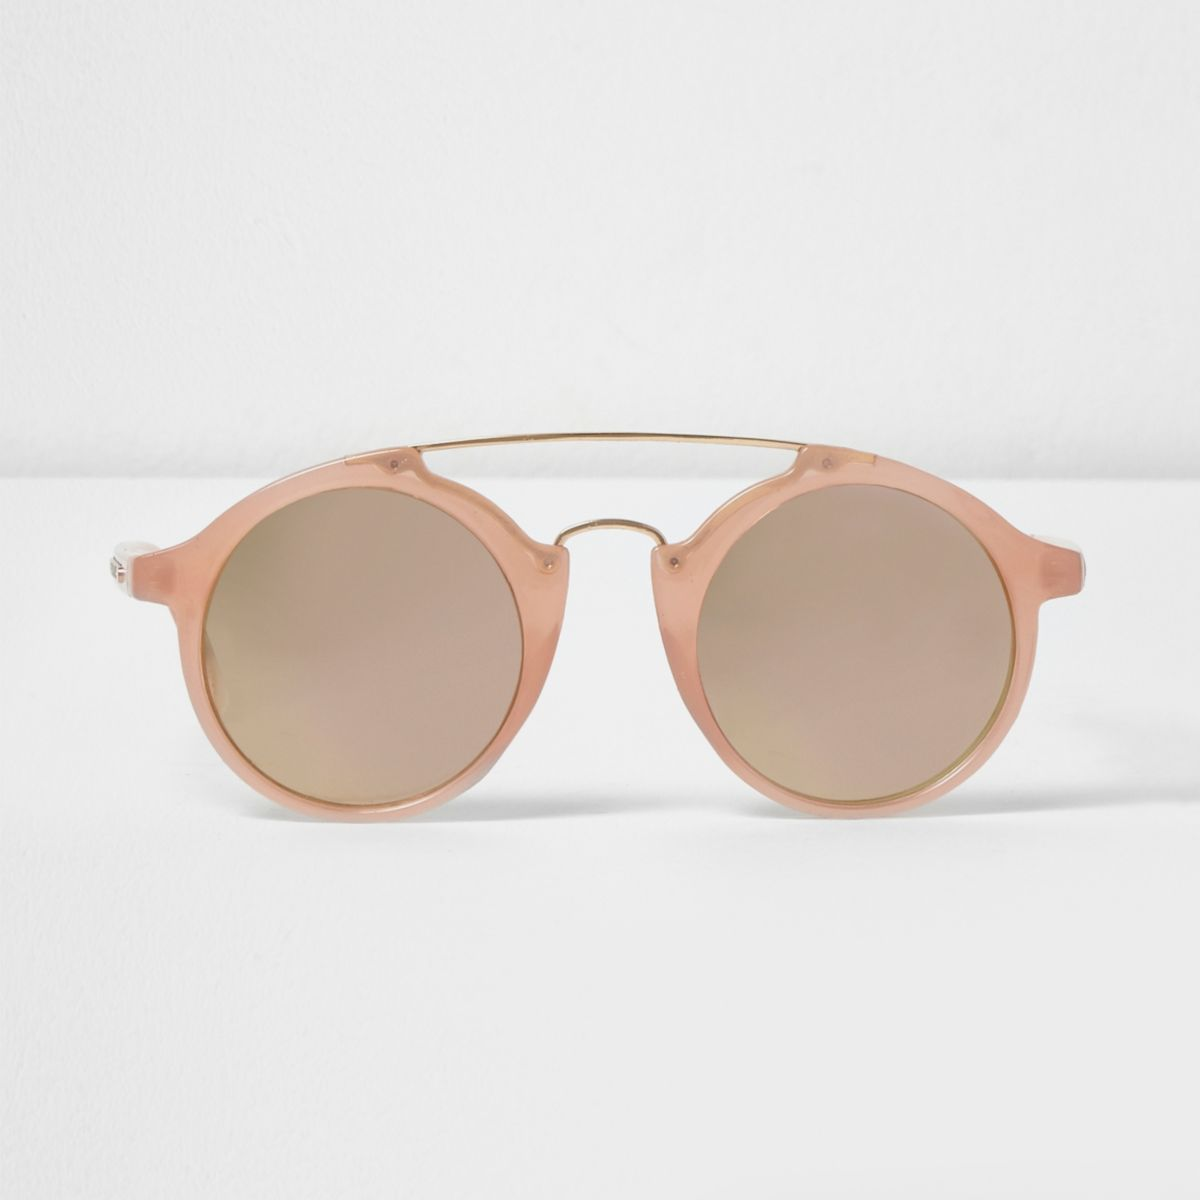 Rose gold tone circle lens sunglasses